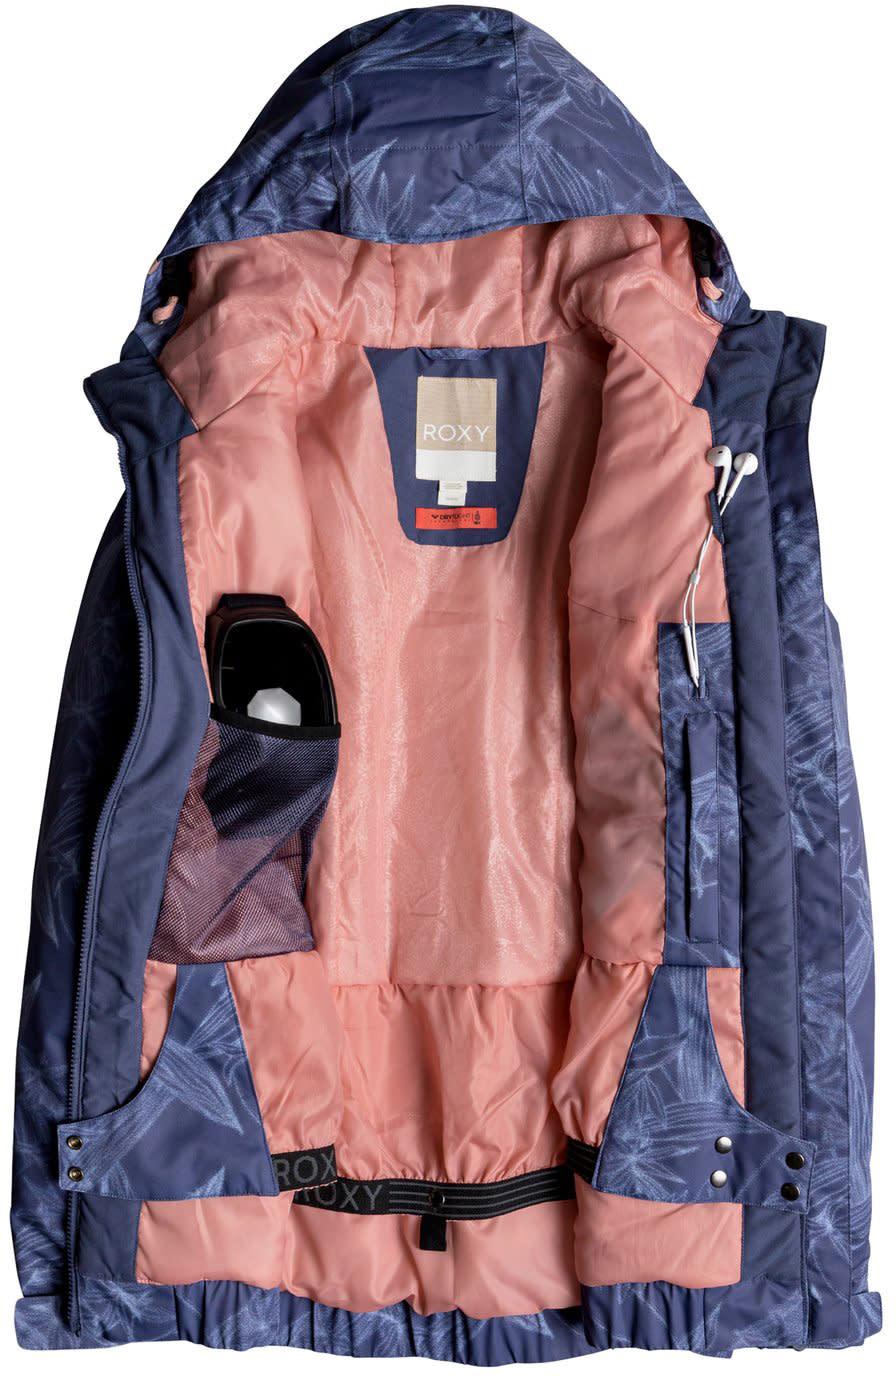 efd3781da72 Roxy-Valley-Hoodie-Snowboard-Jacket-Womens thumbnail 6